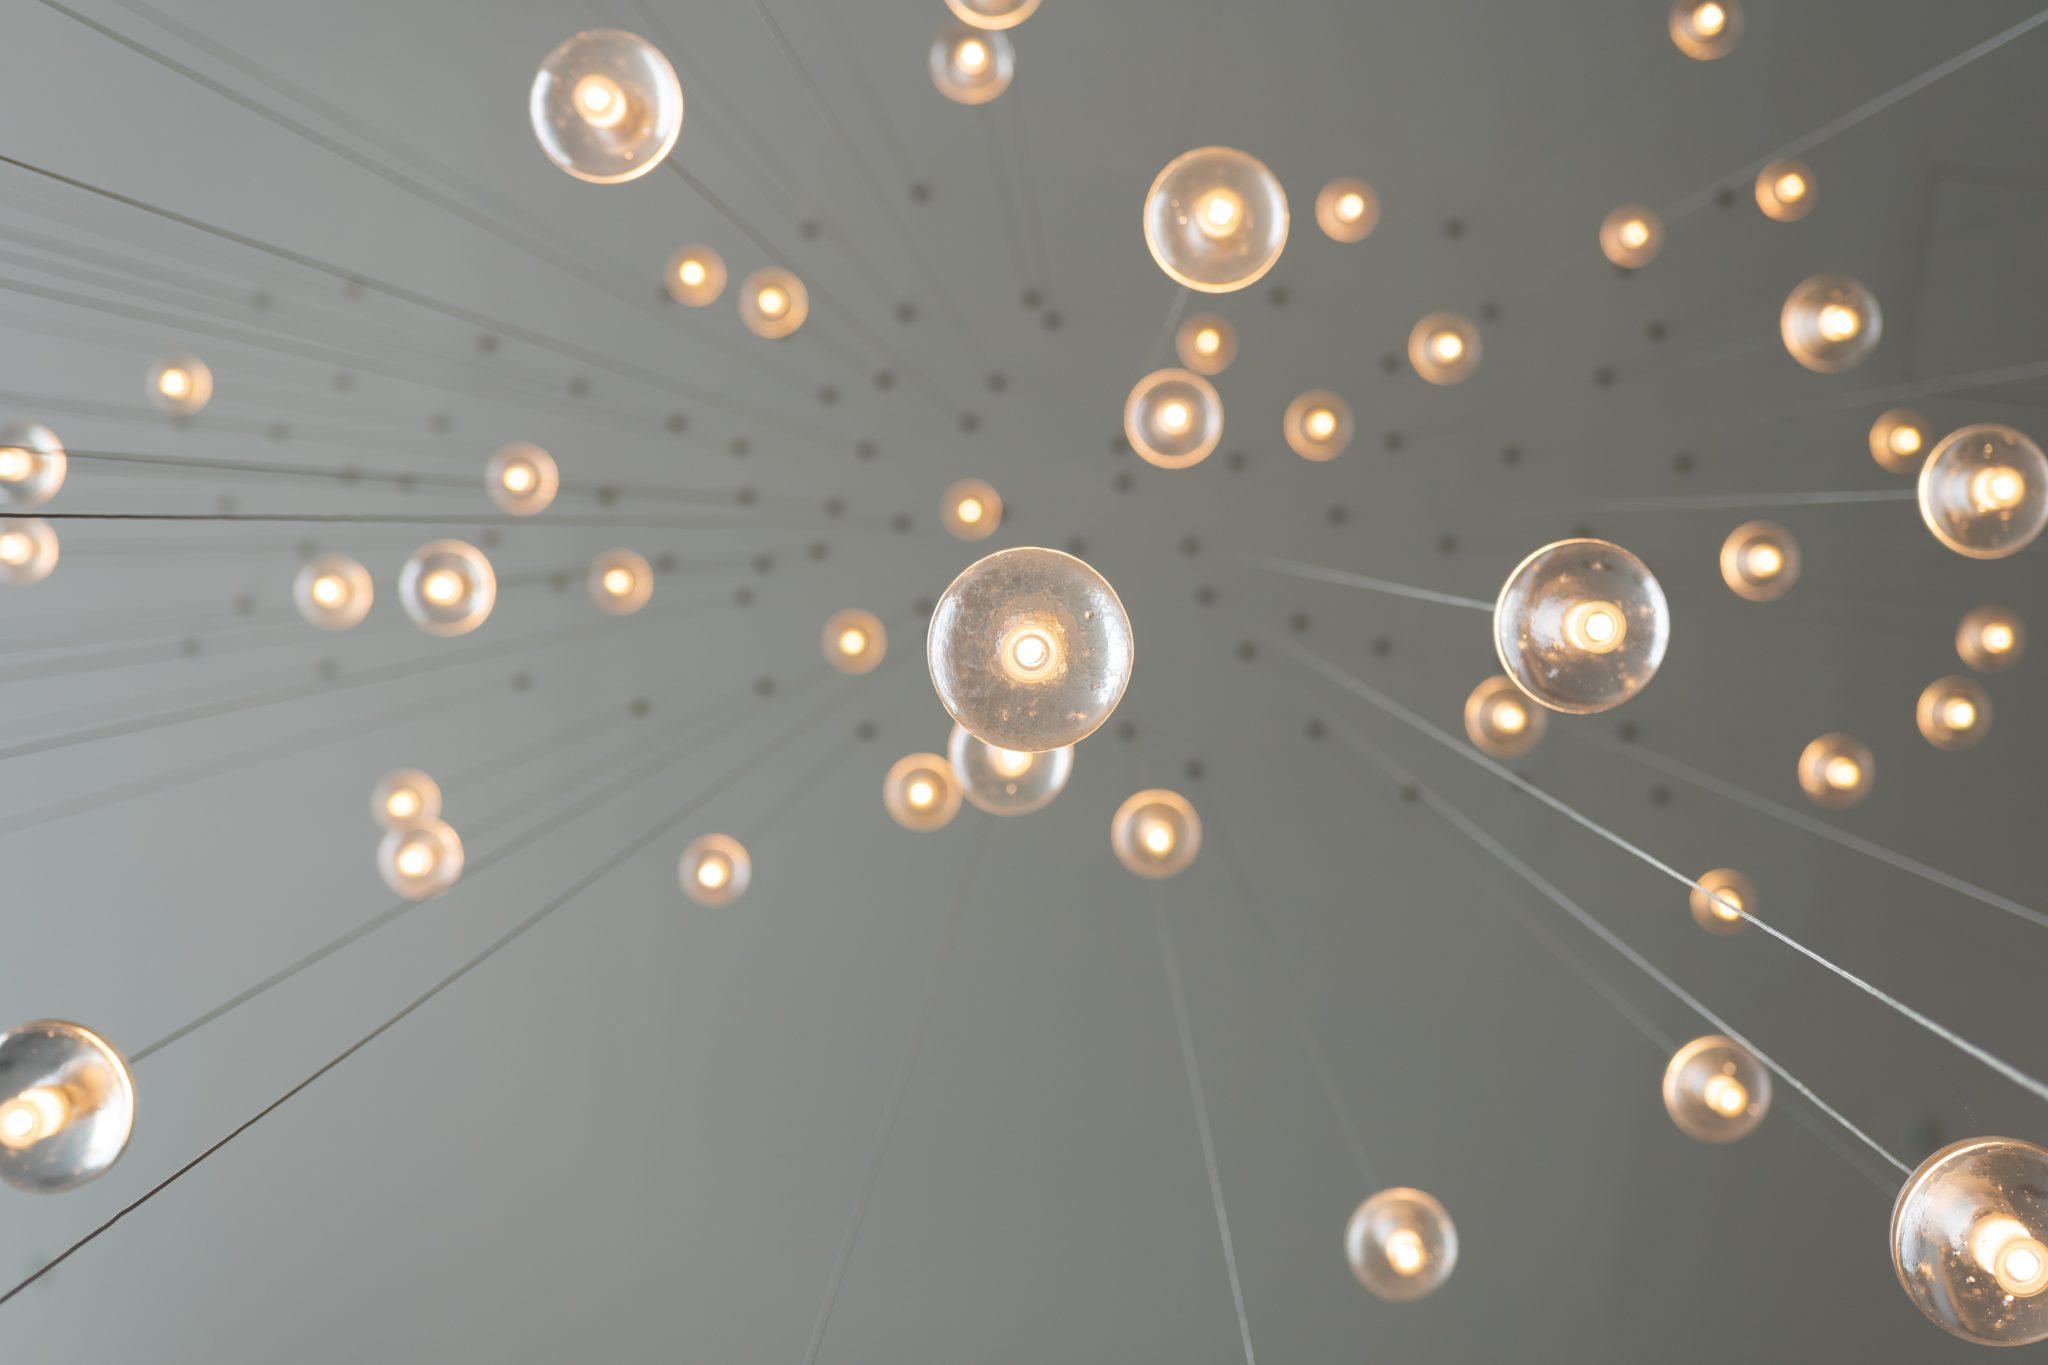 ARHA Studio - Etude d'éclairage